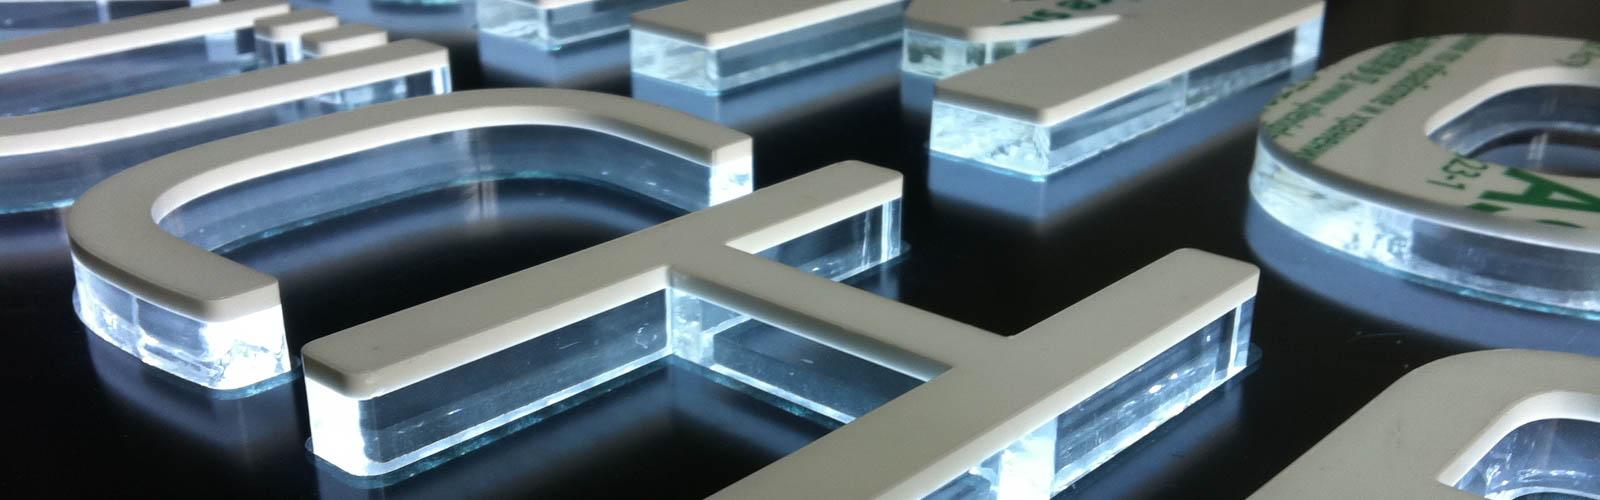 Kunststoff Verarbeitung